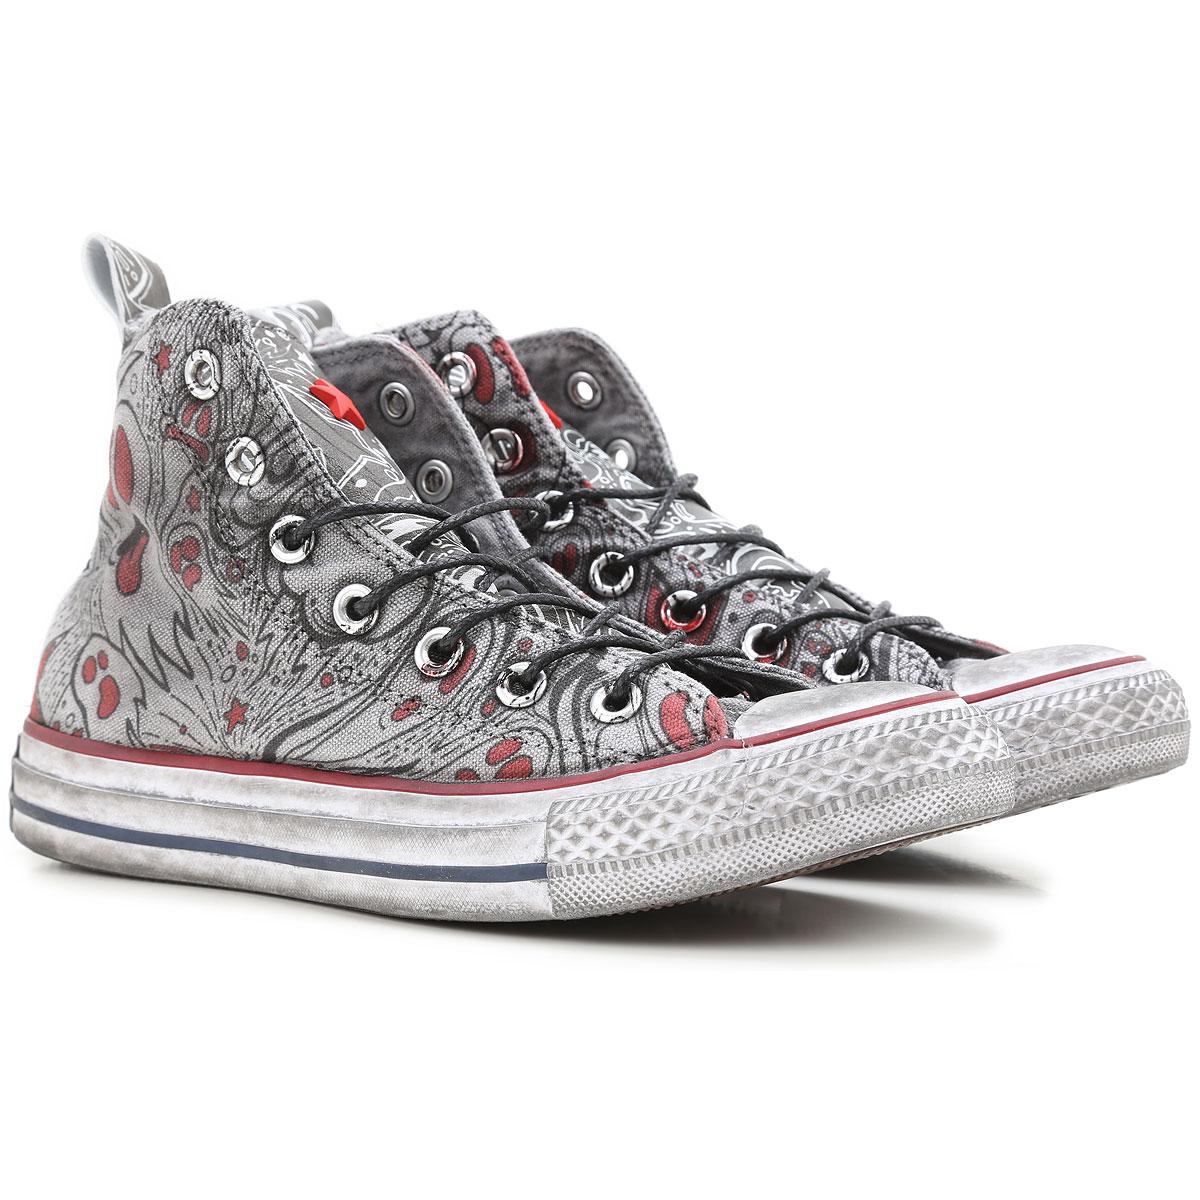 Scarpe Donna Sneakers Converse Offerte Limitate